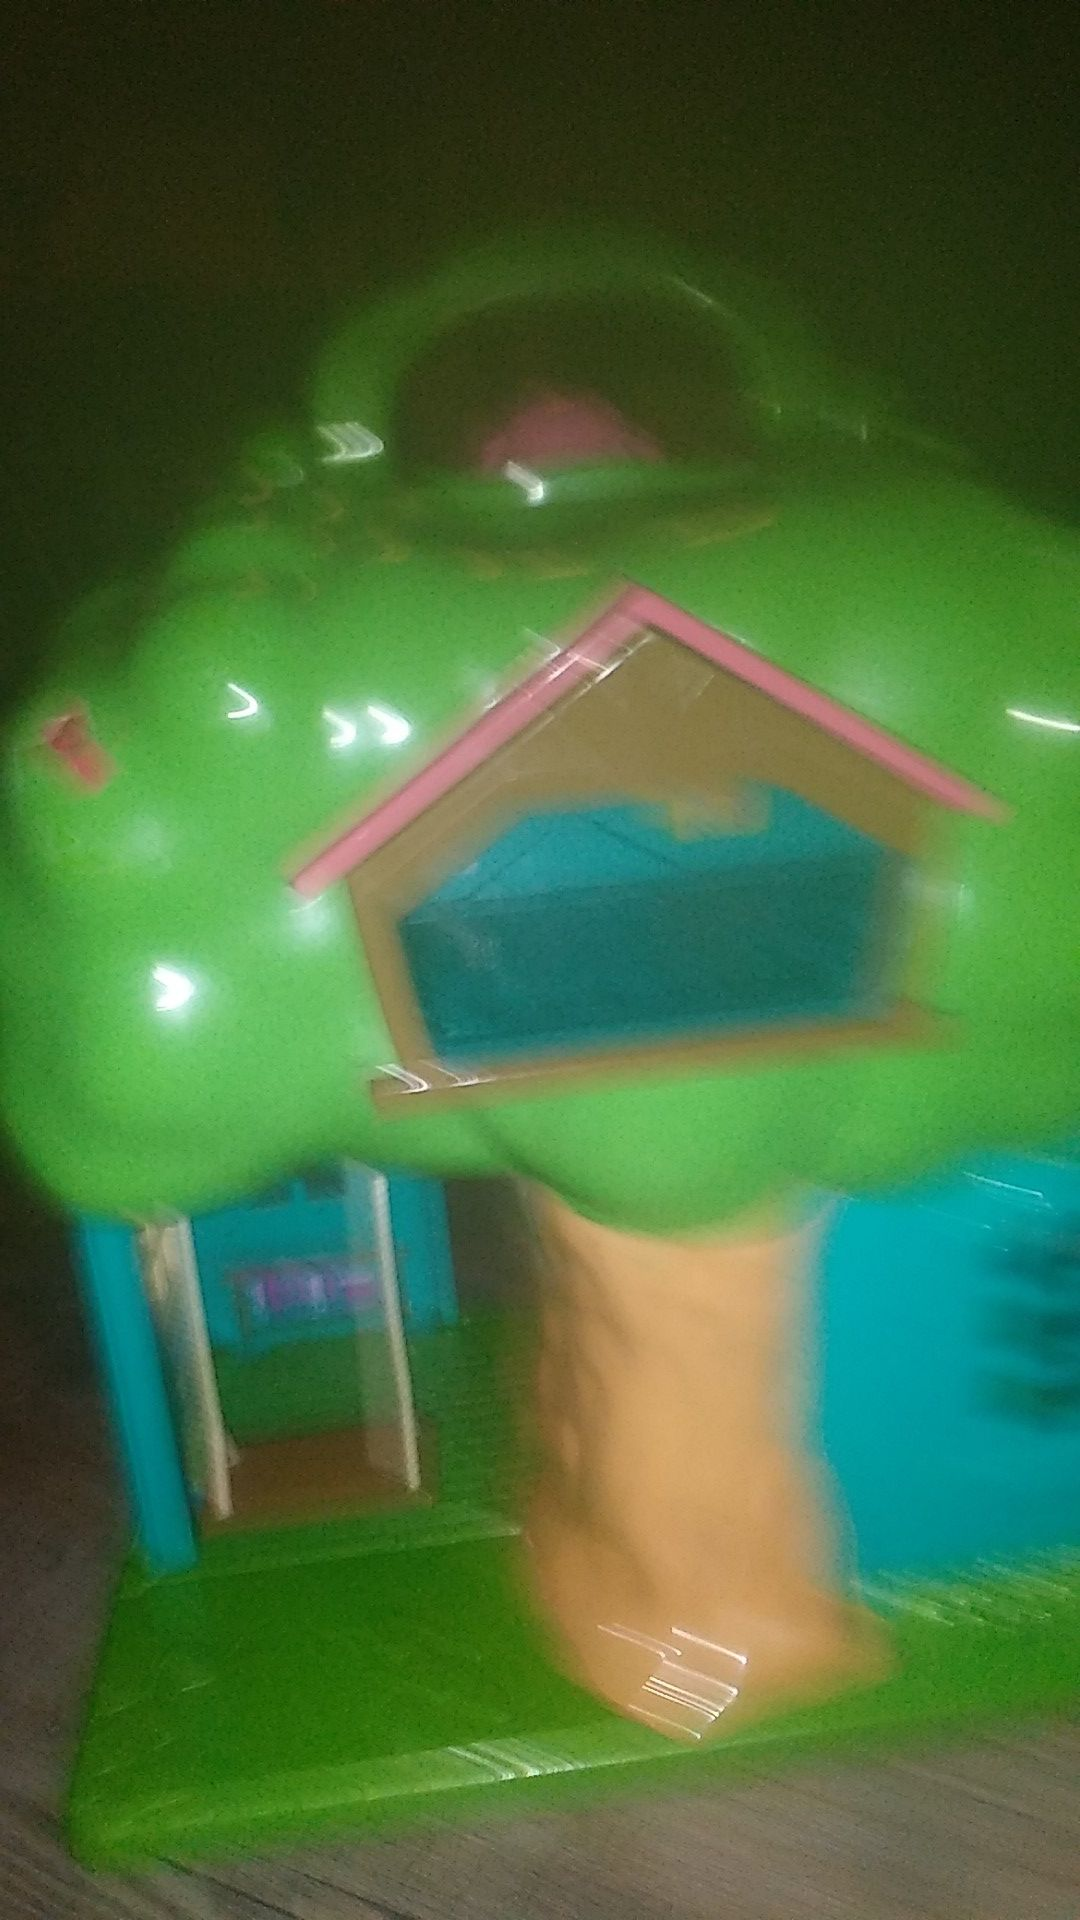 School lol house